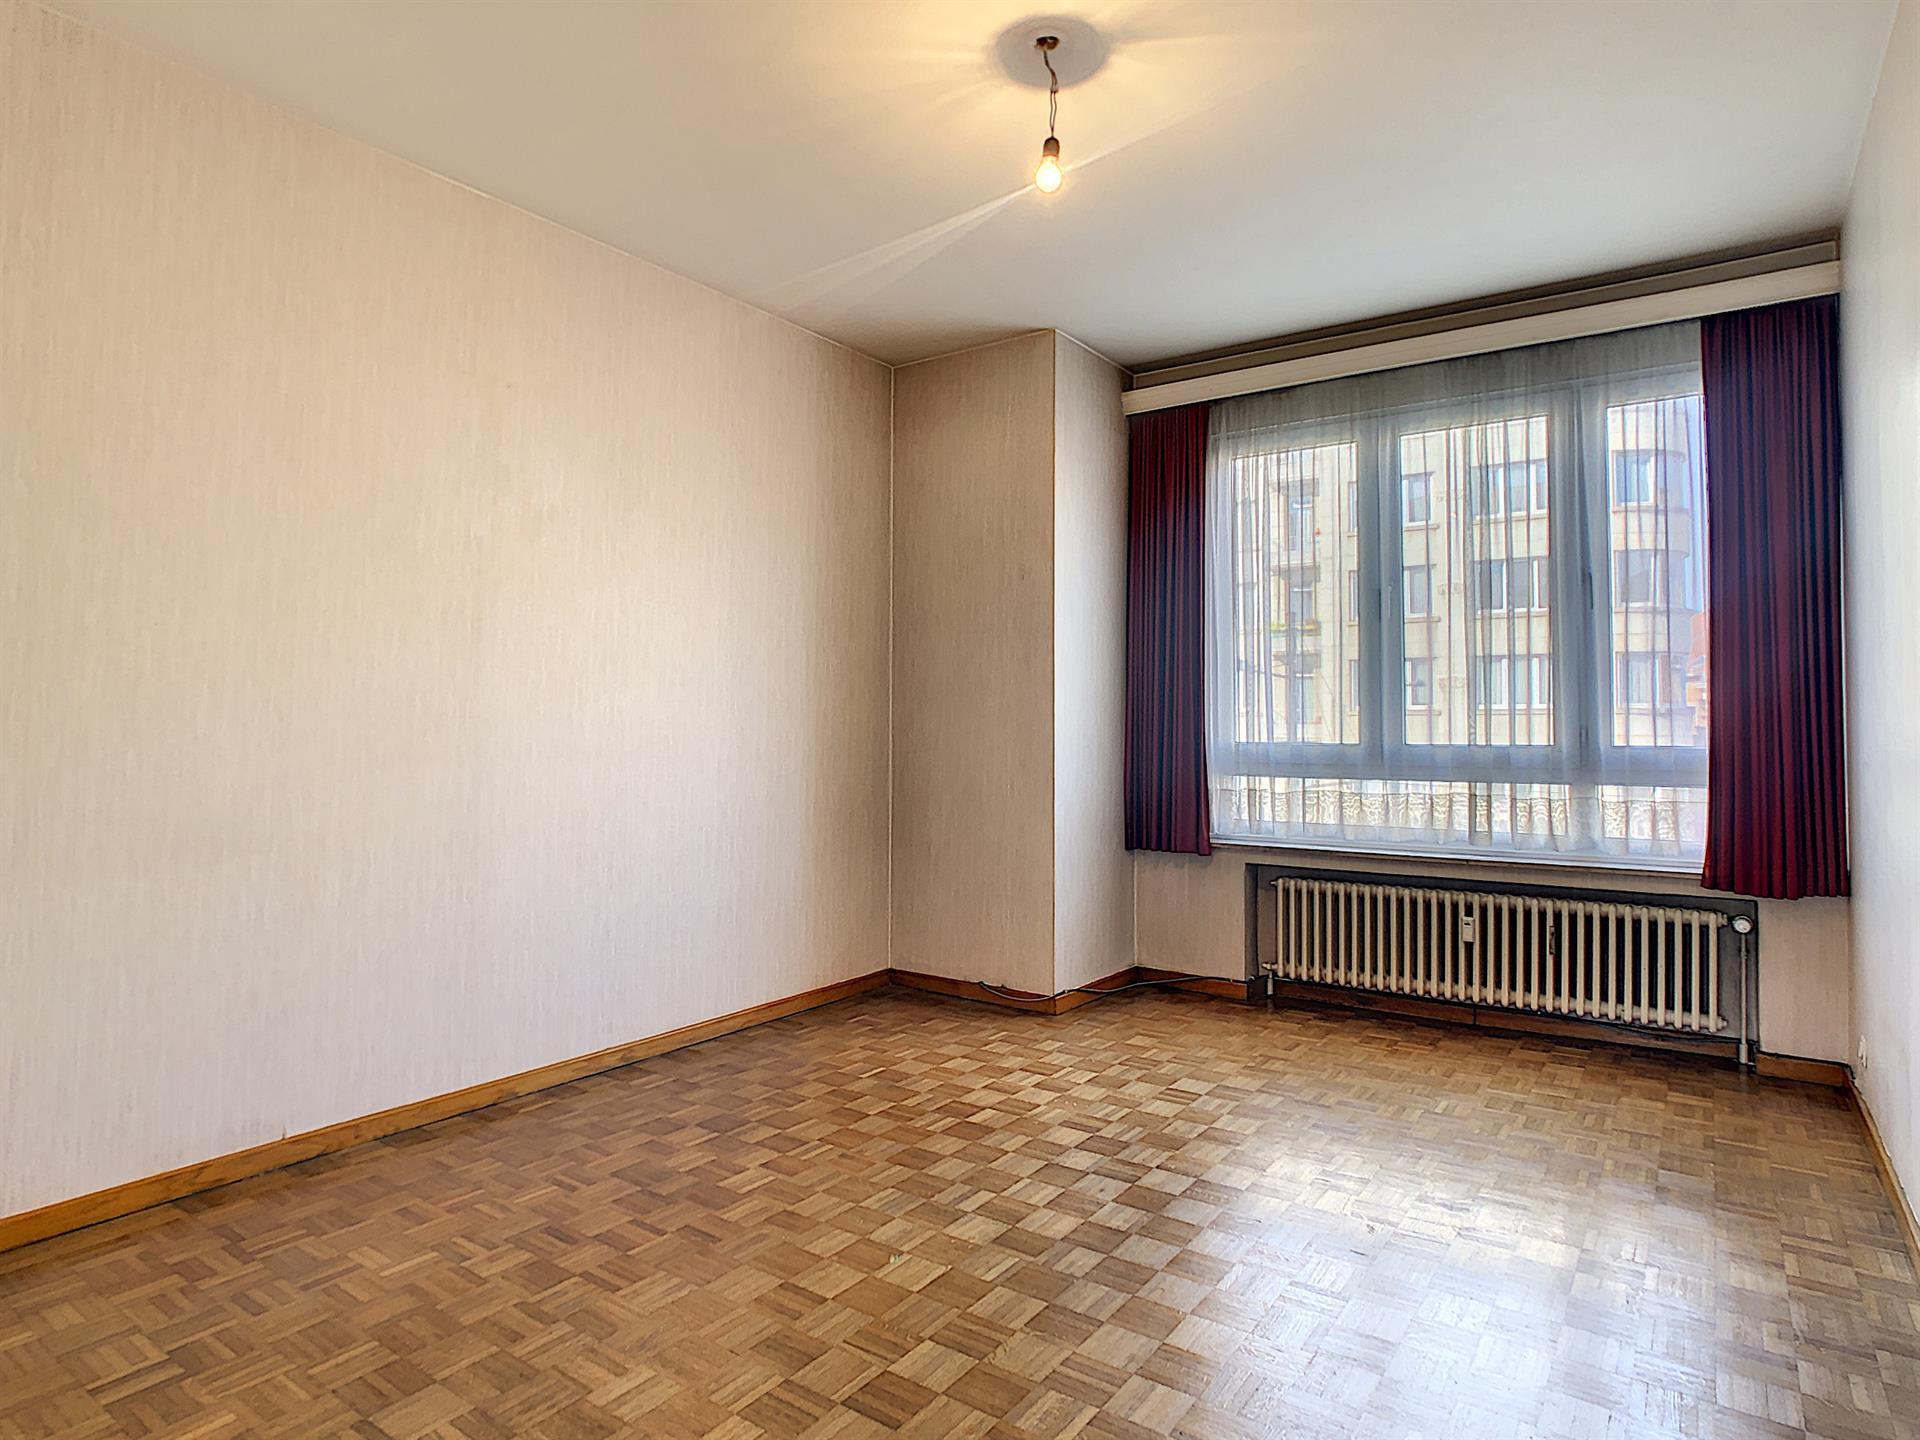 Appartement - Jette - #4157042-2